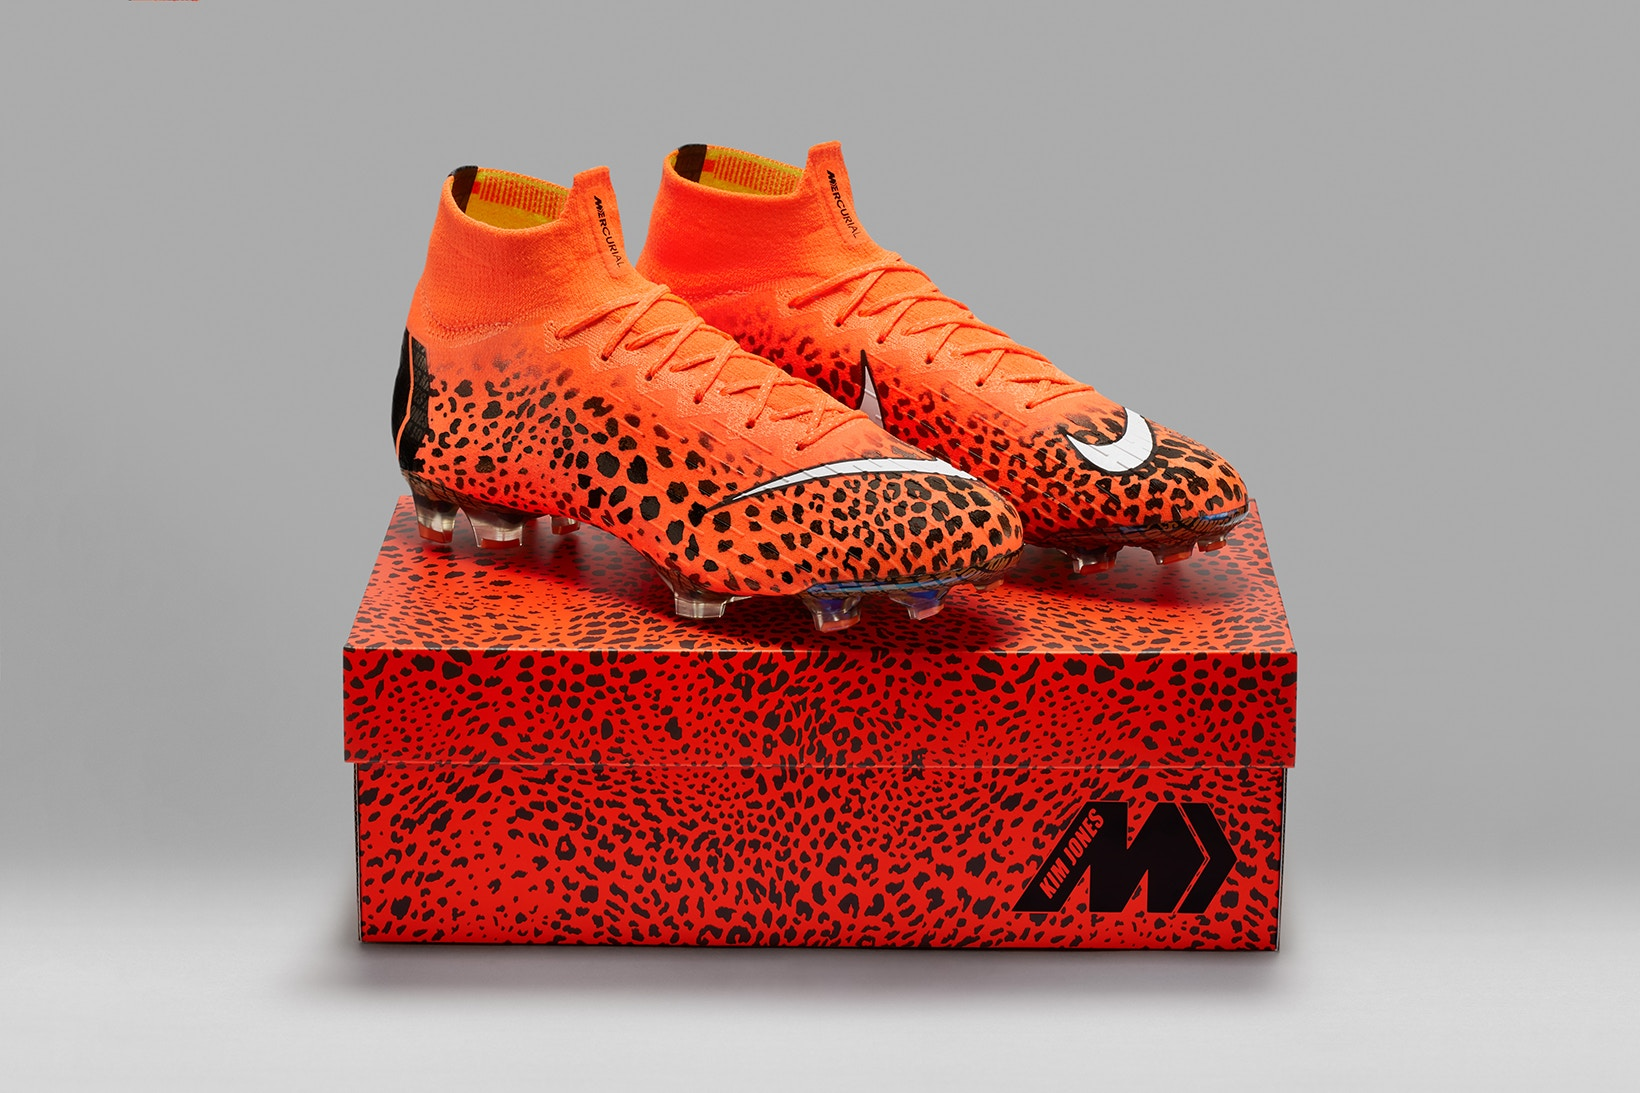 kim-jones-nike-football-boot-mercurial-superfly-004